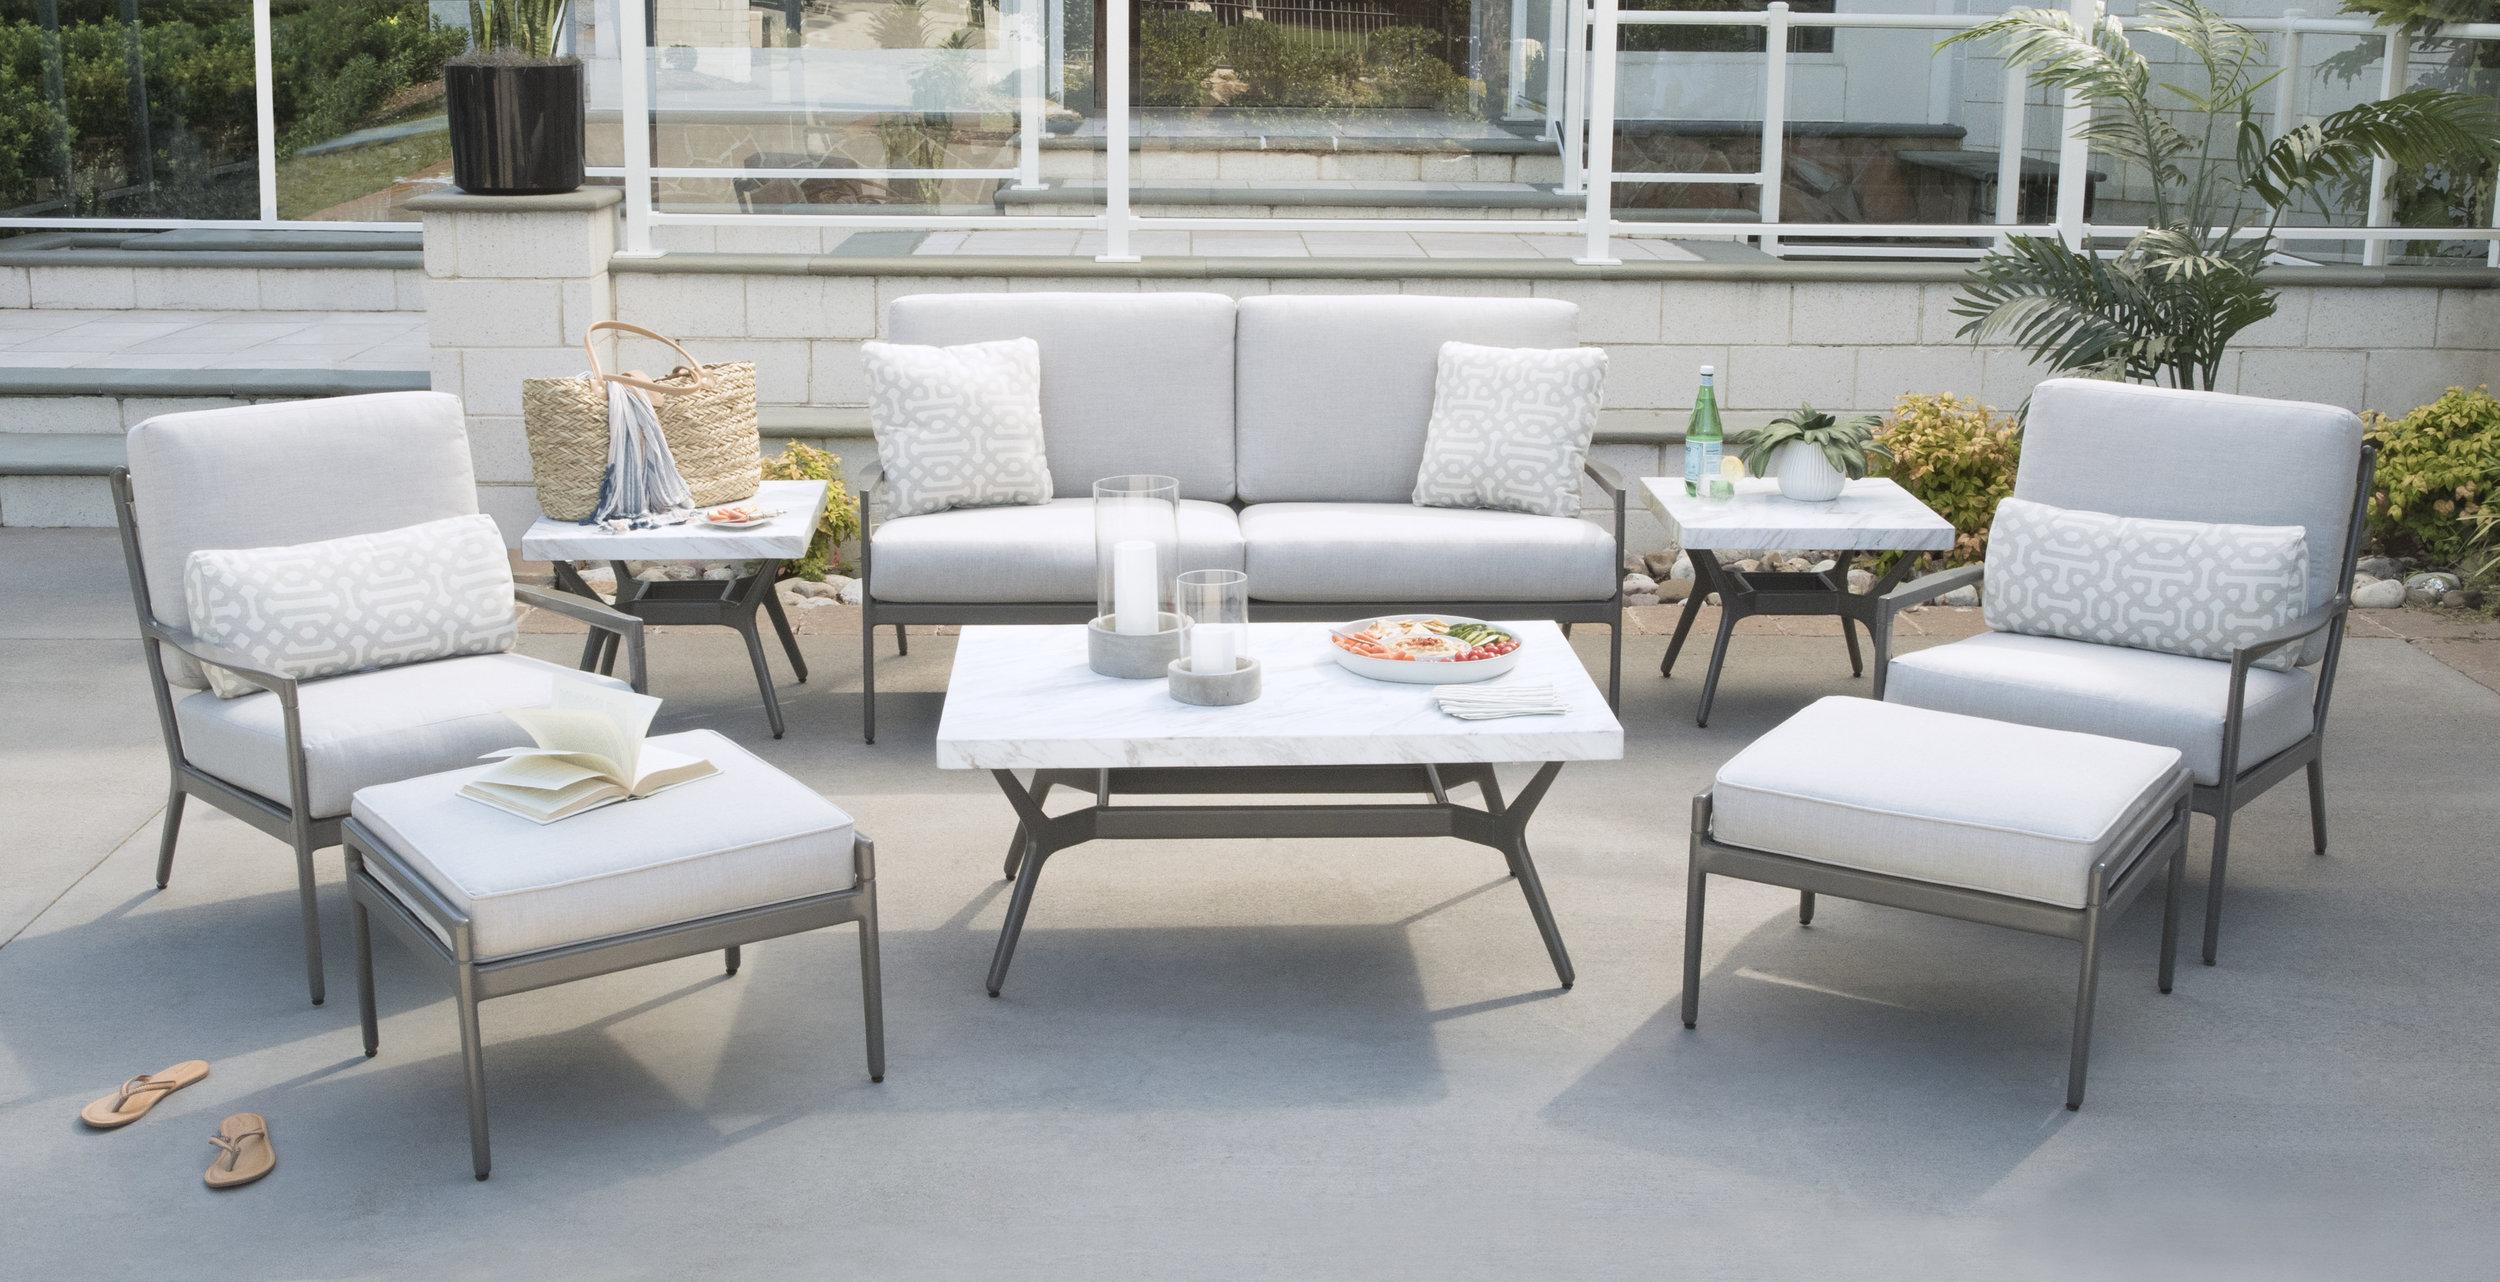 White Modern Deep Seating Patio Collection .jpg